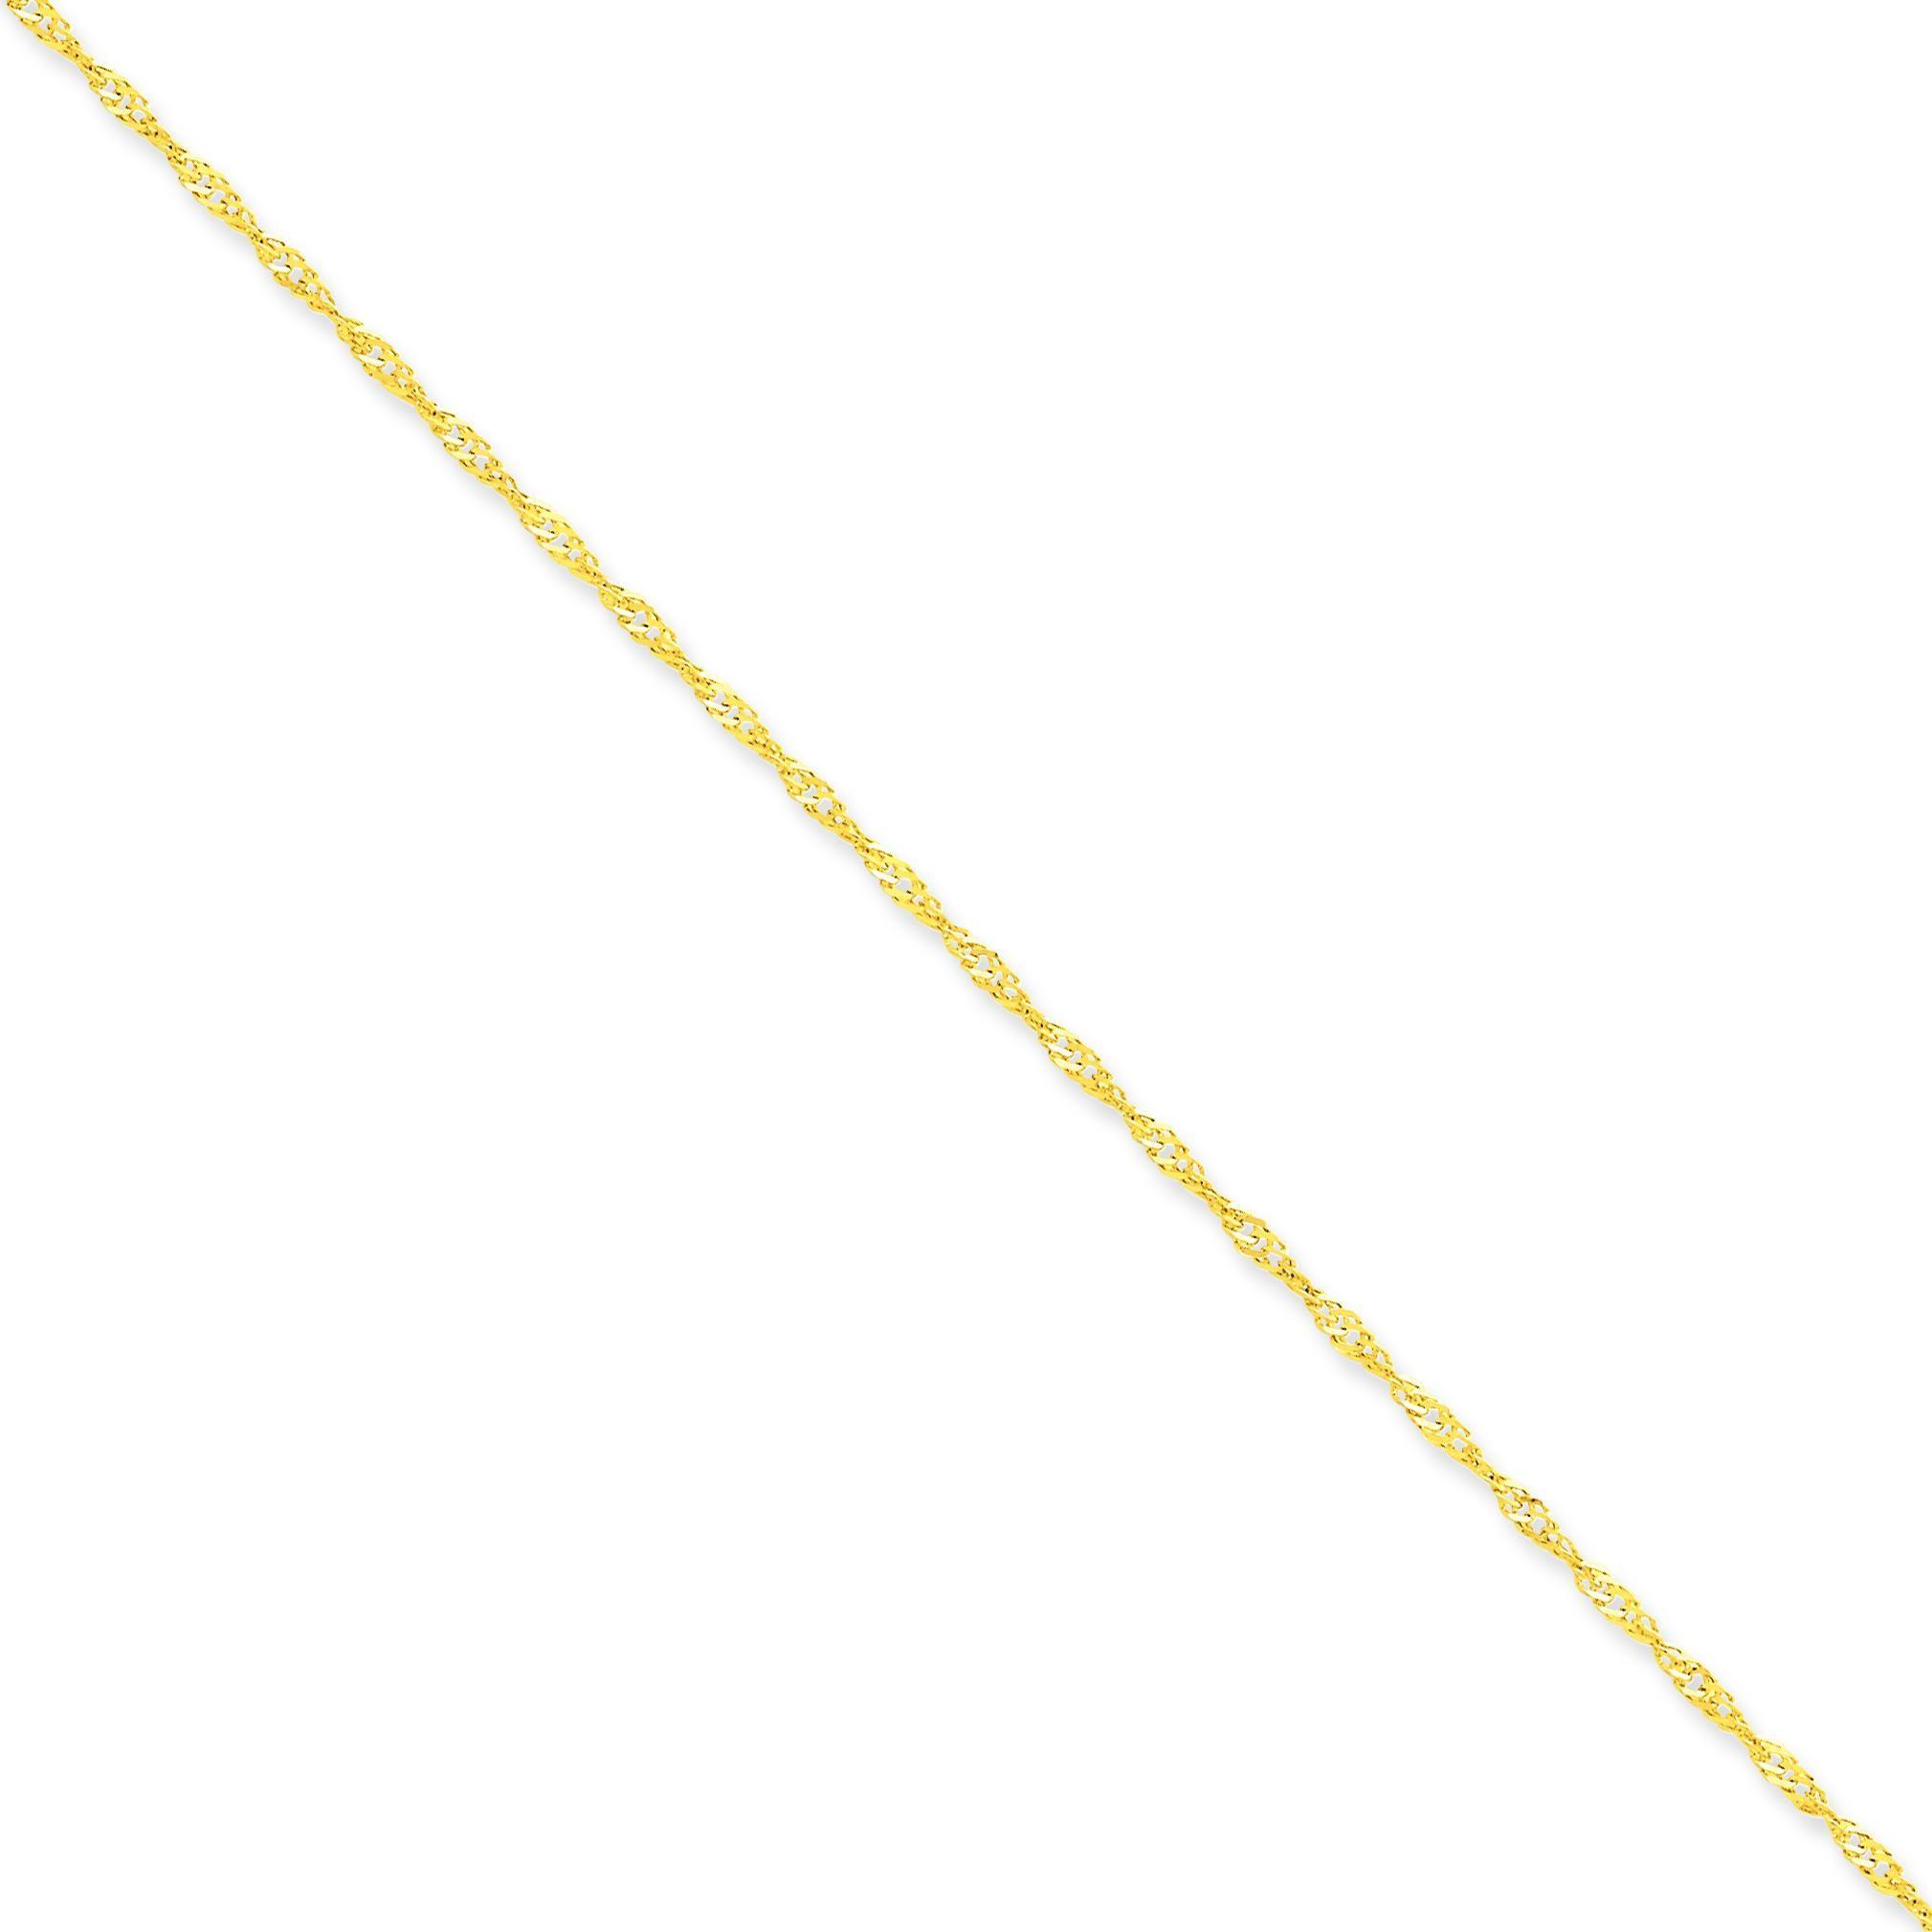 14k Yellow Gold 7 inch 1.70 mm  Singapore Chain Bracelet